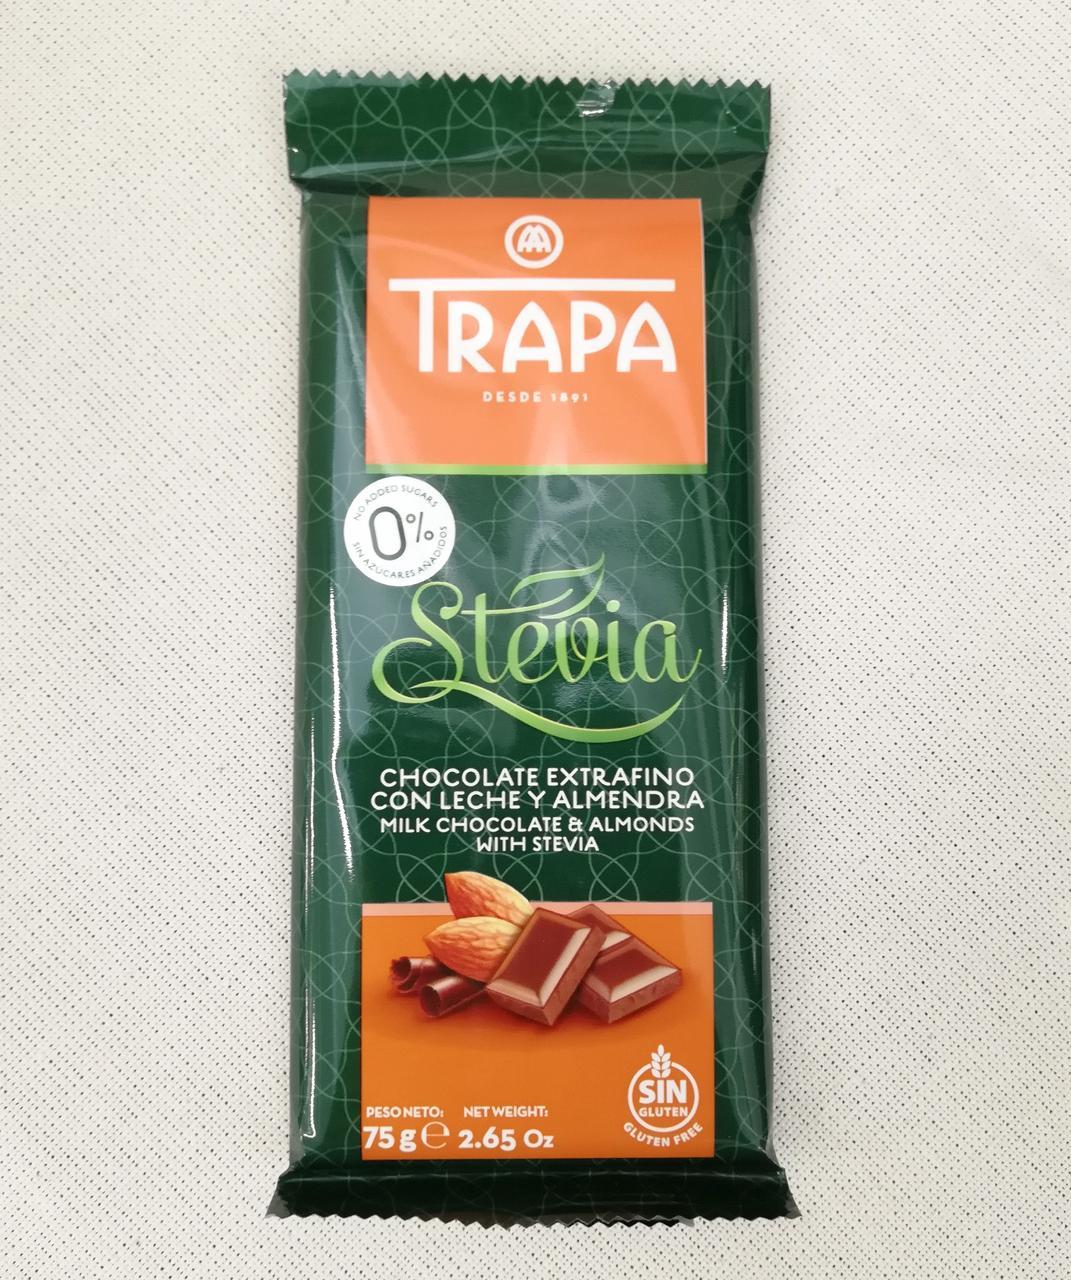 Шоколад без сахара Trapa Stevia Milk Chocolate with Almonds 75 gramm